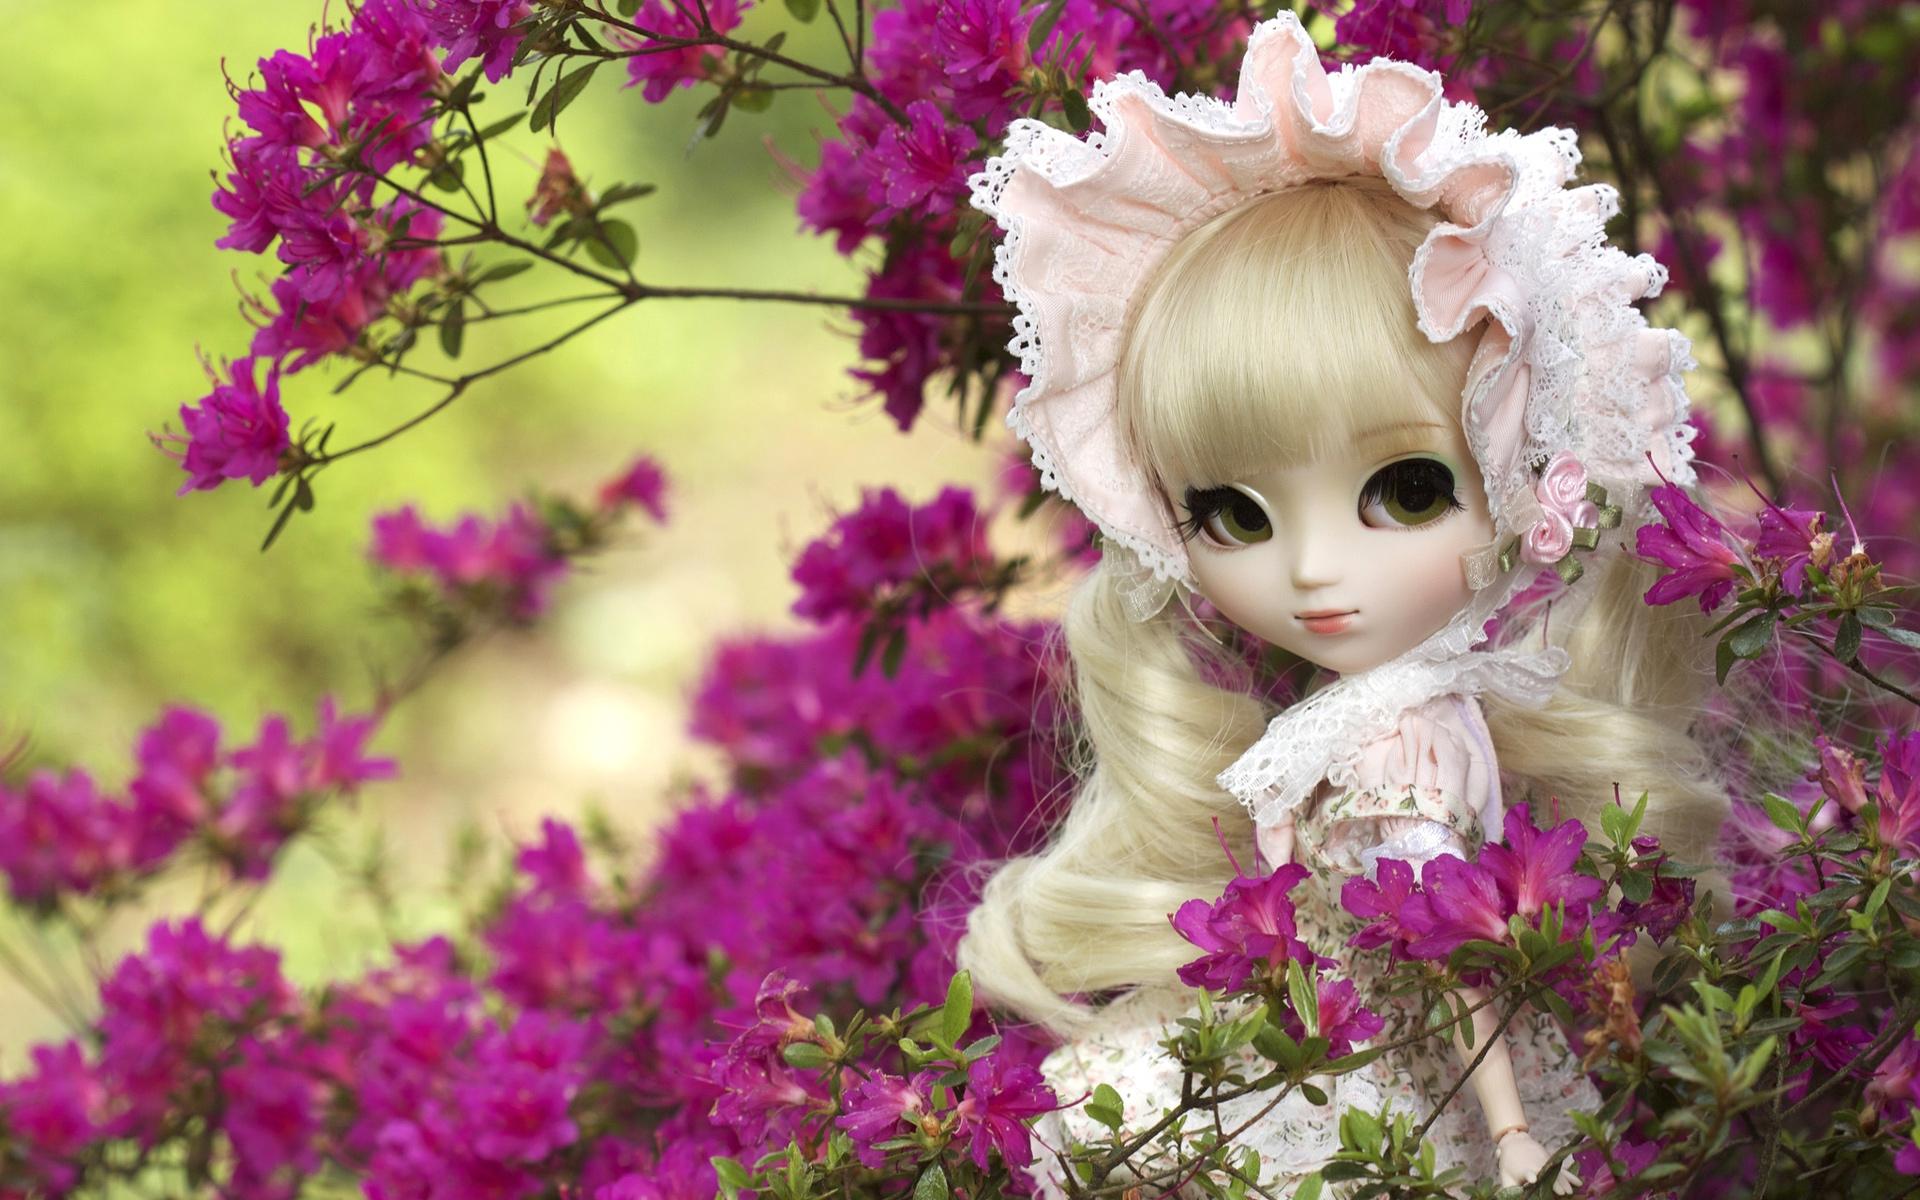 Wallpaper download cute - Cute Doll Girl Hd Wallpaper